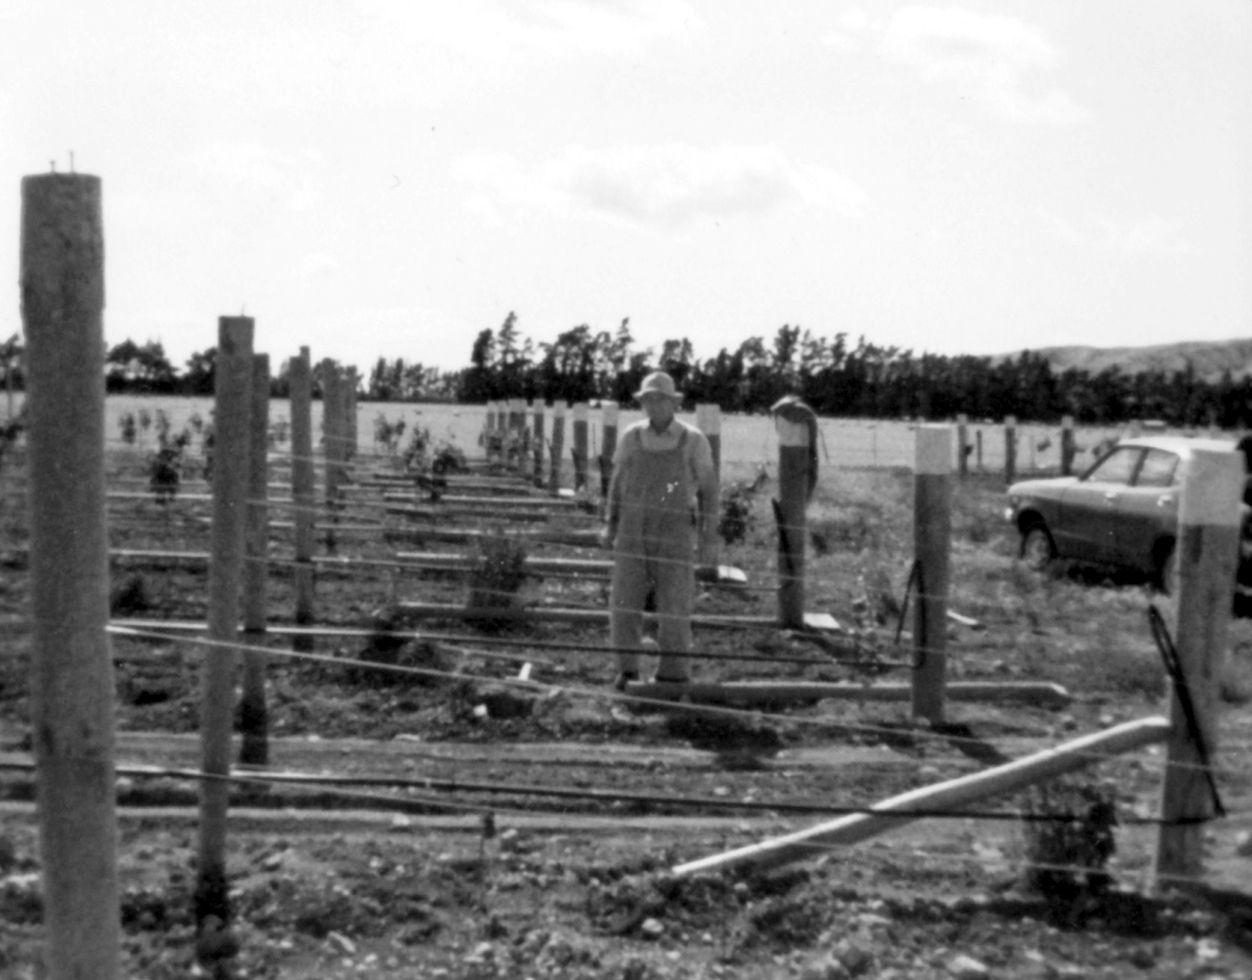 saint-clair-family-estate-vinbanken-vineyard-early-days